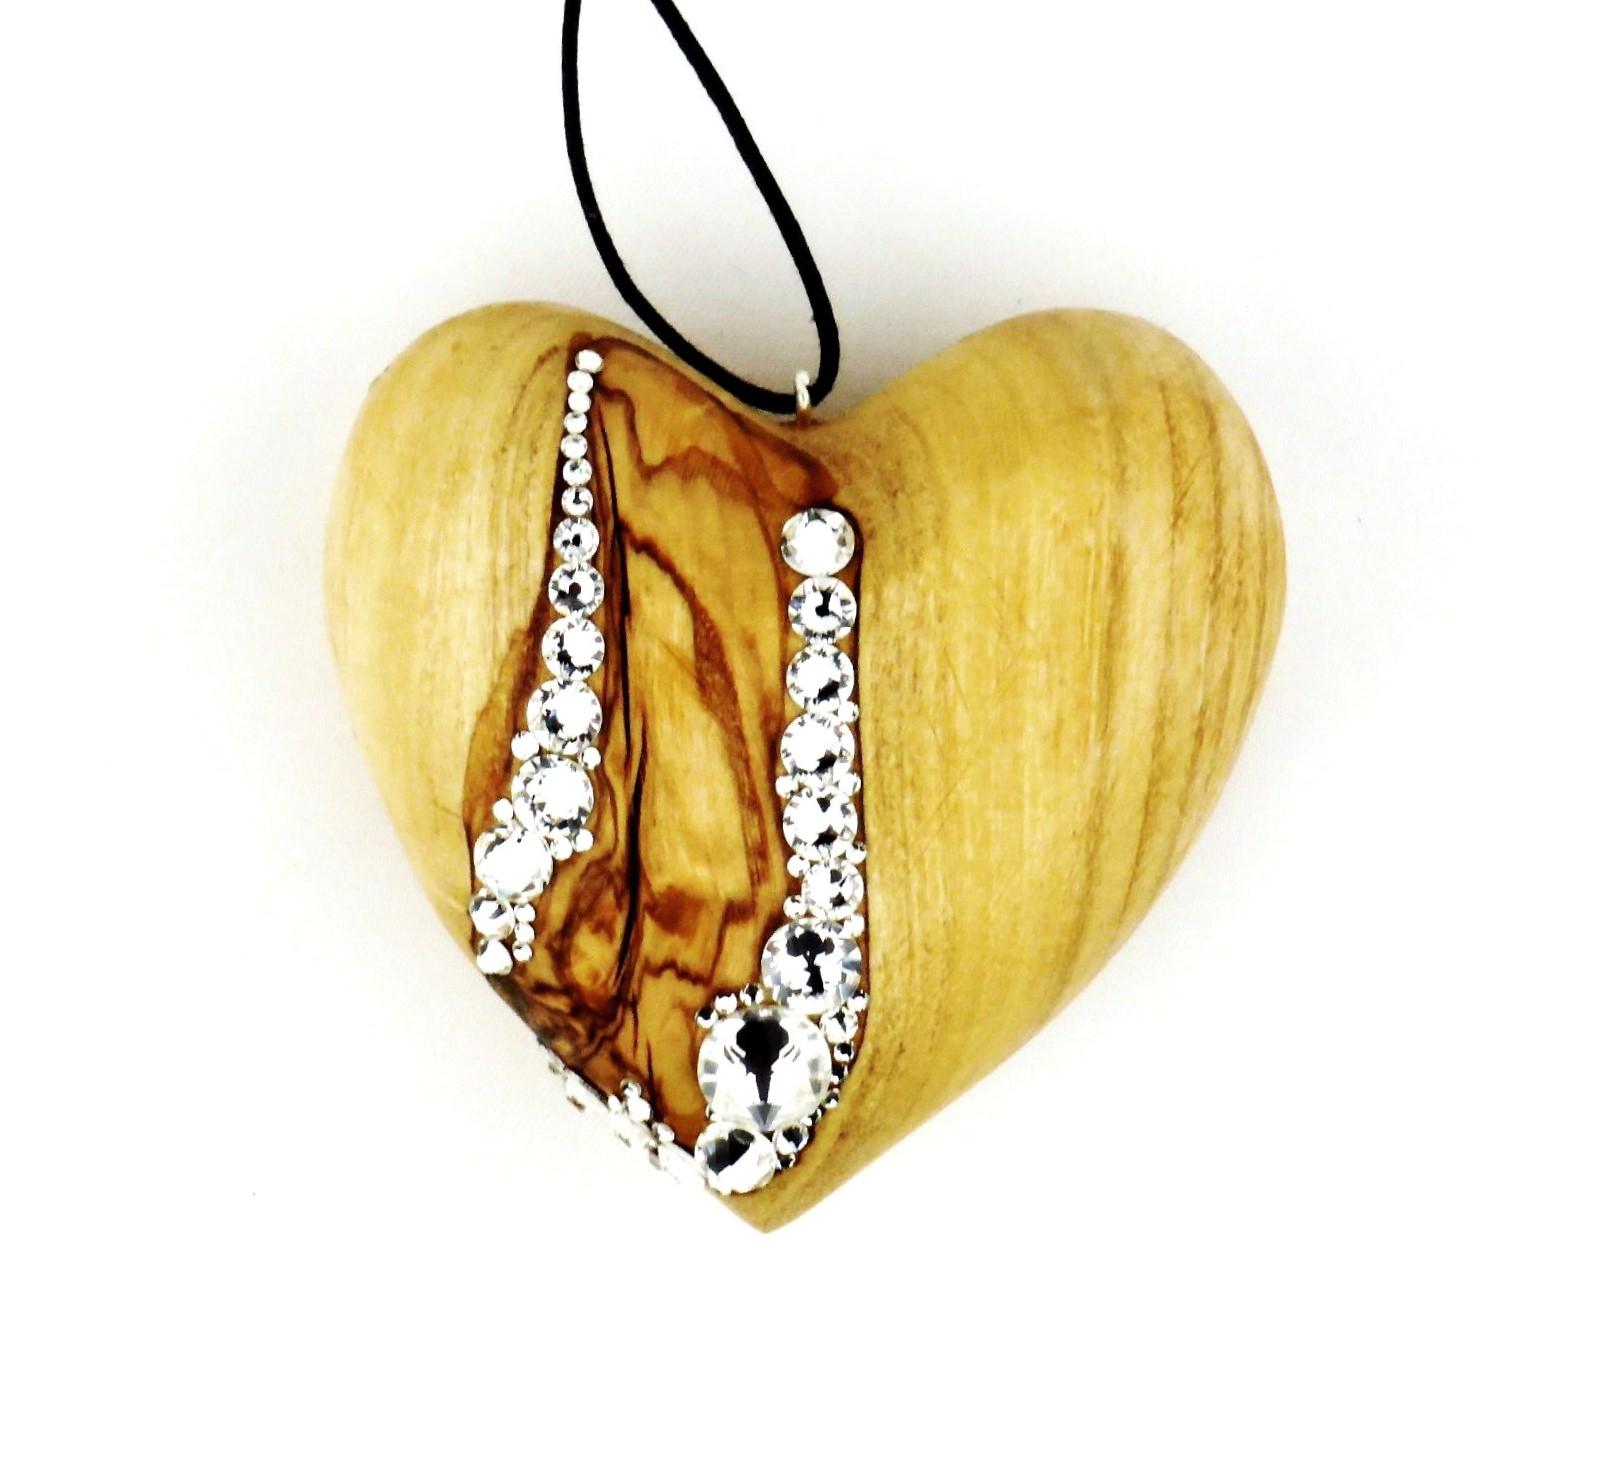 woodenhandmadehearts